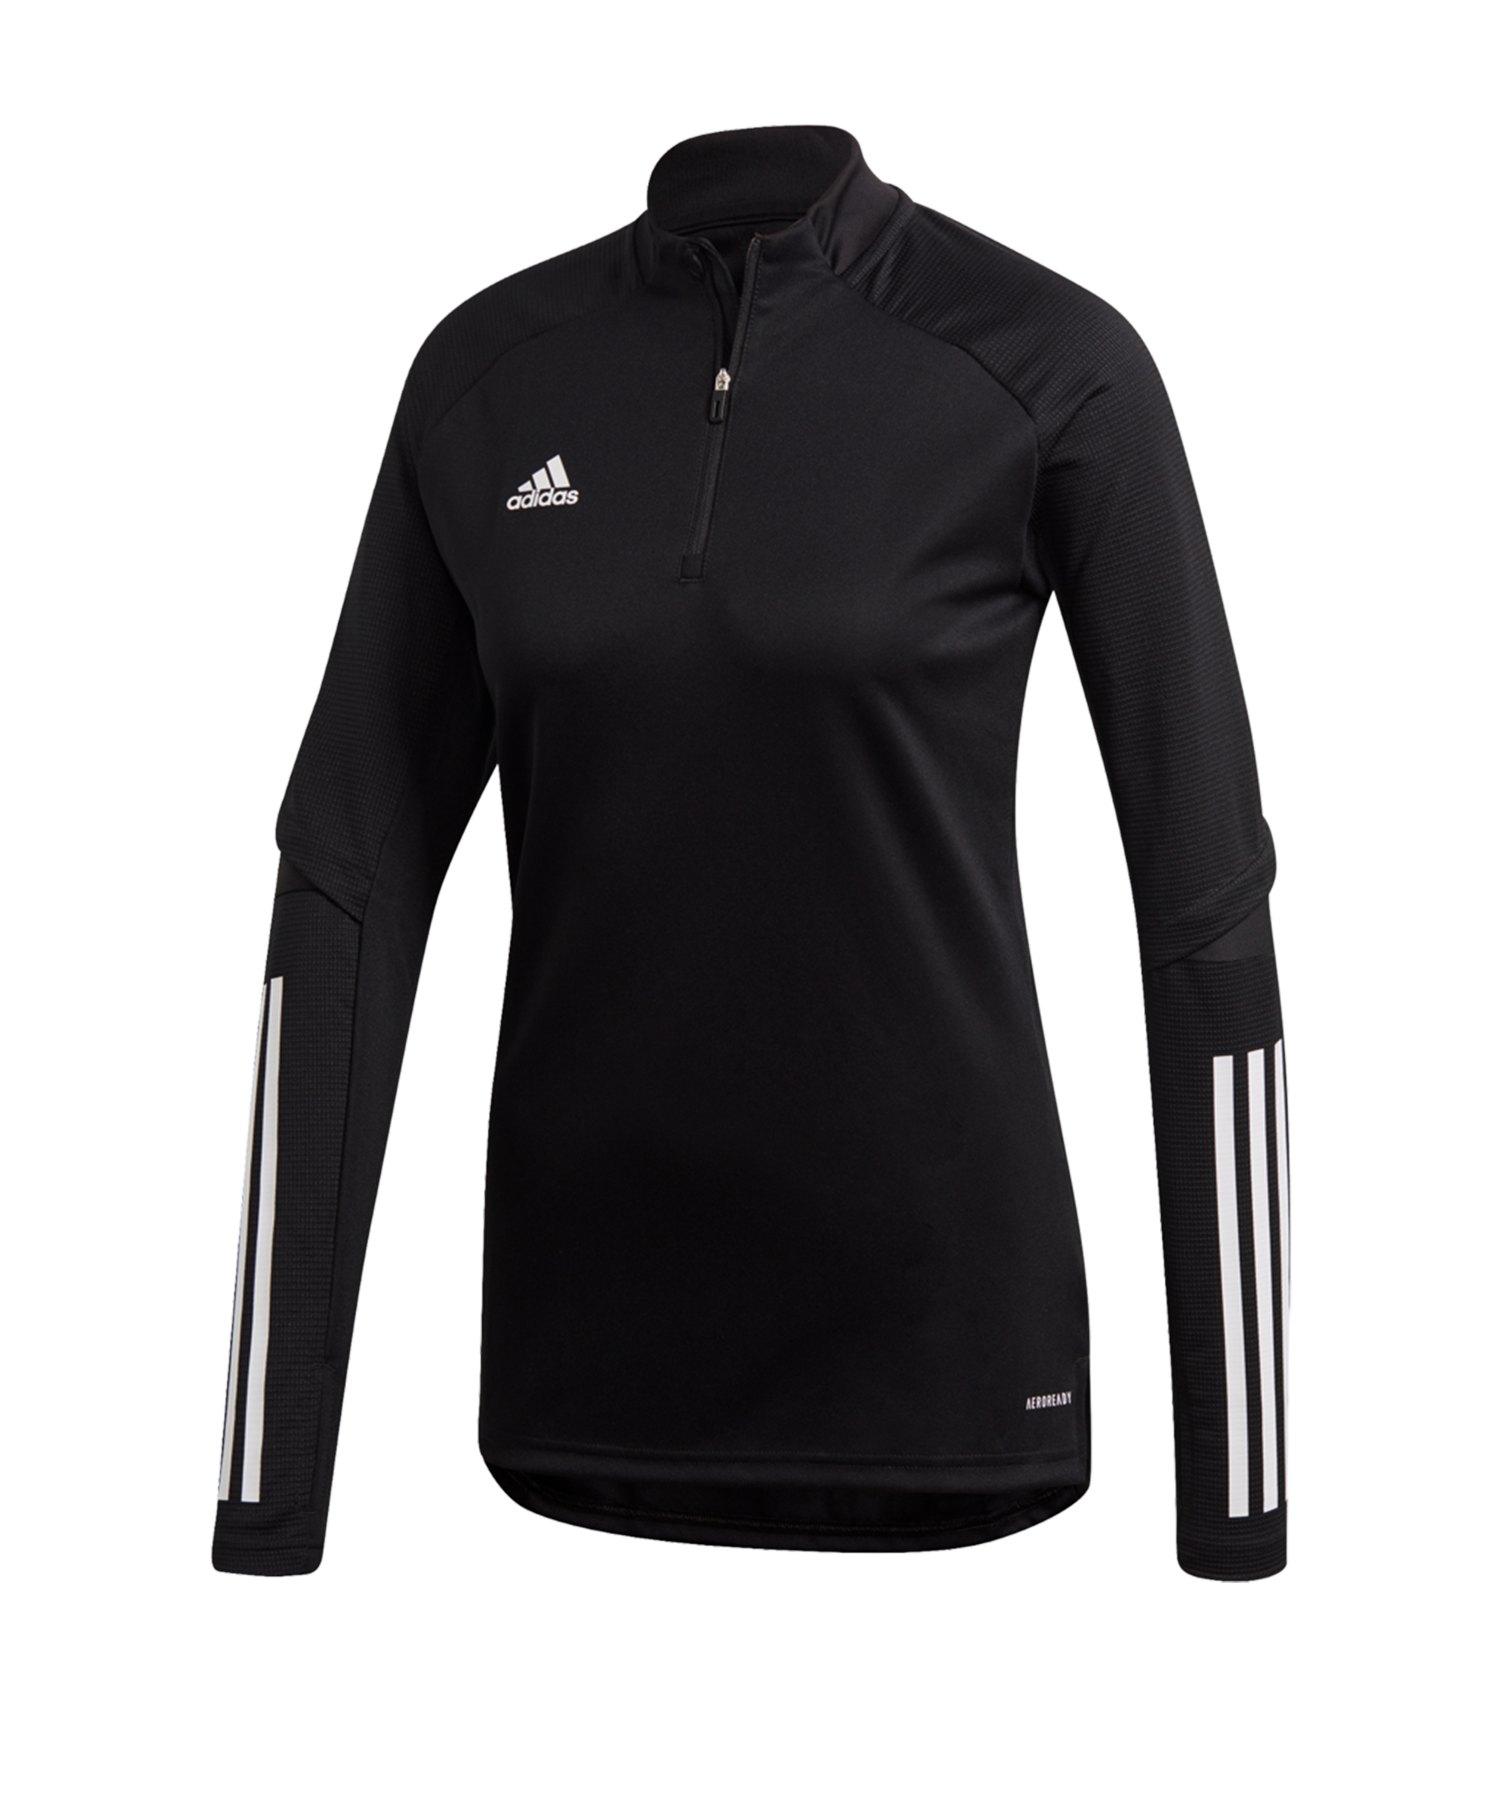 adidas Condivo 20 Trainingstop LA Damen Schwarz - schwarz